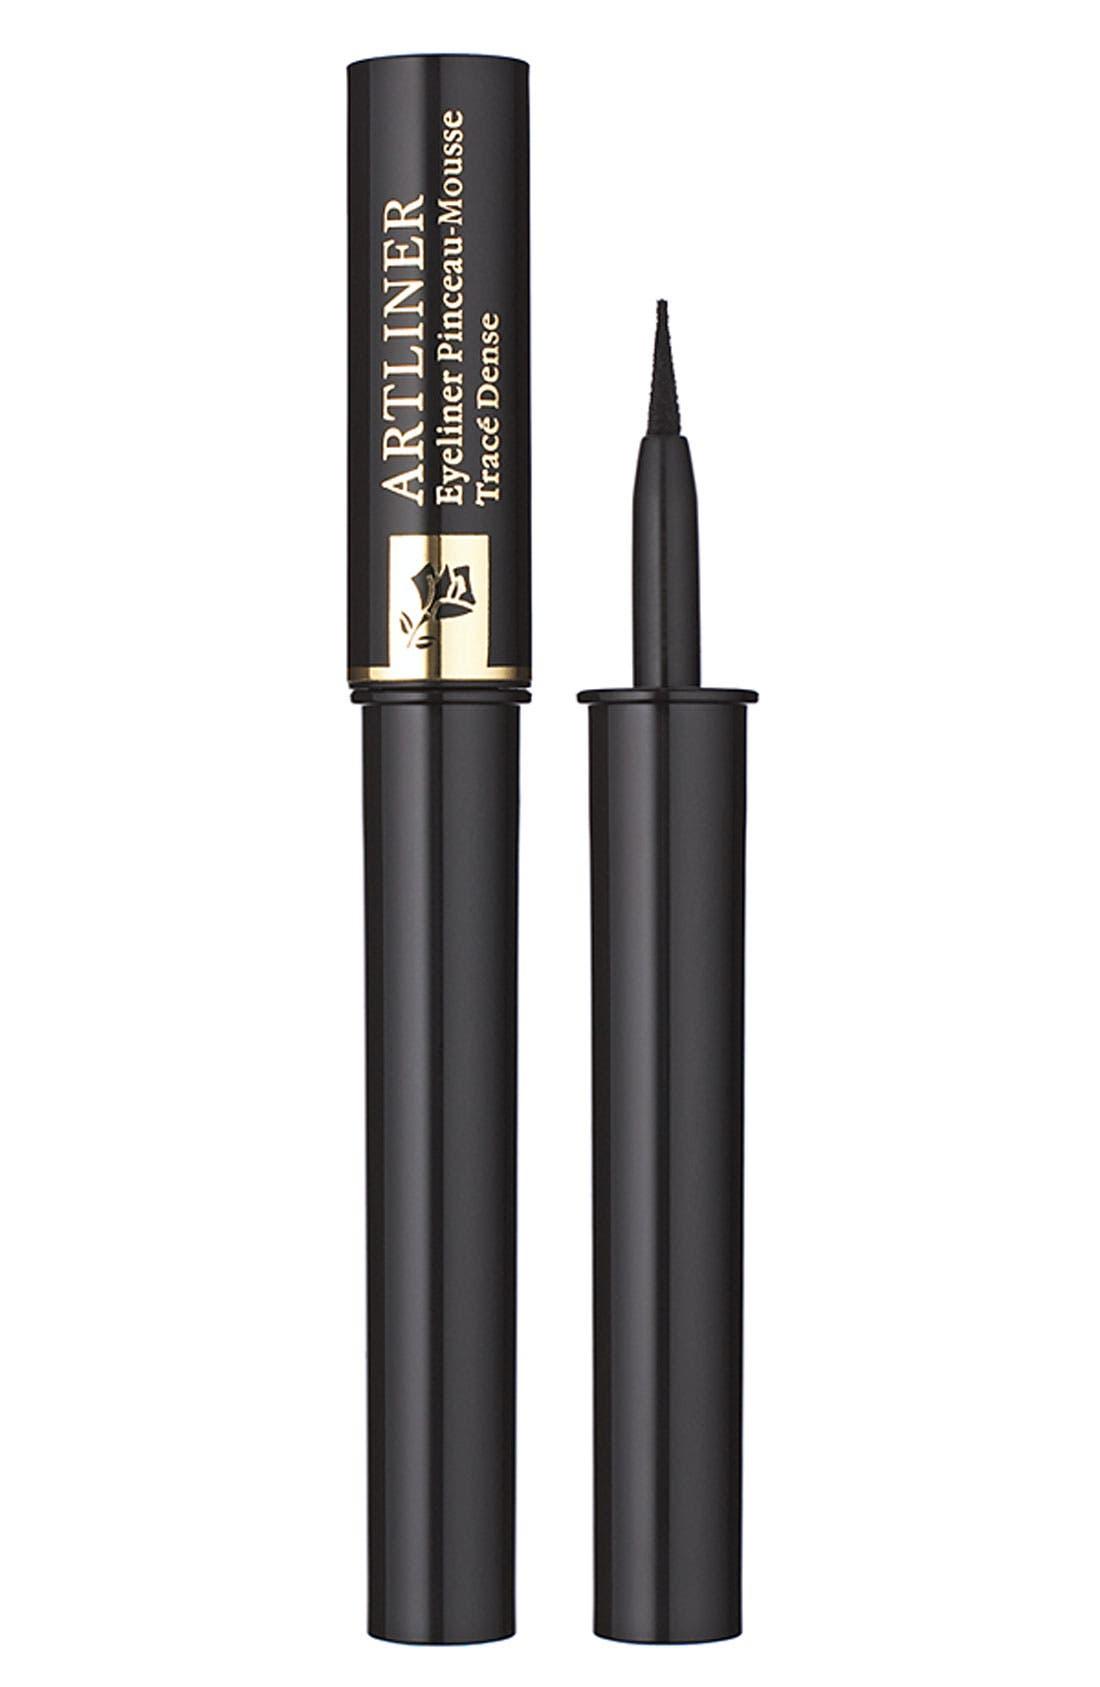 Lancôme Artliner Precision Point Liquid Eyeliner